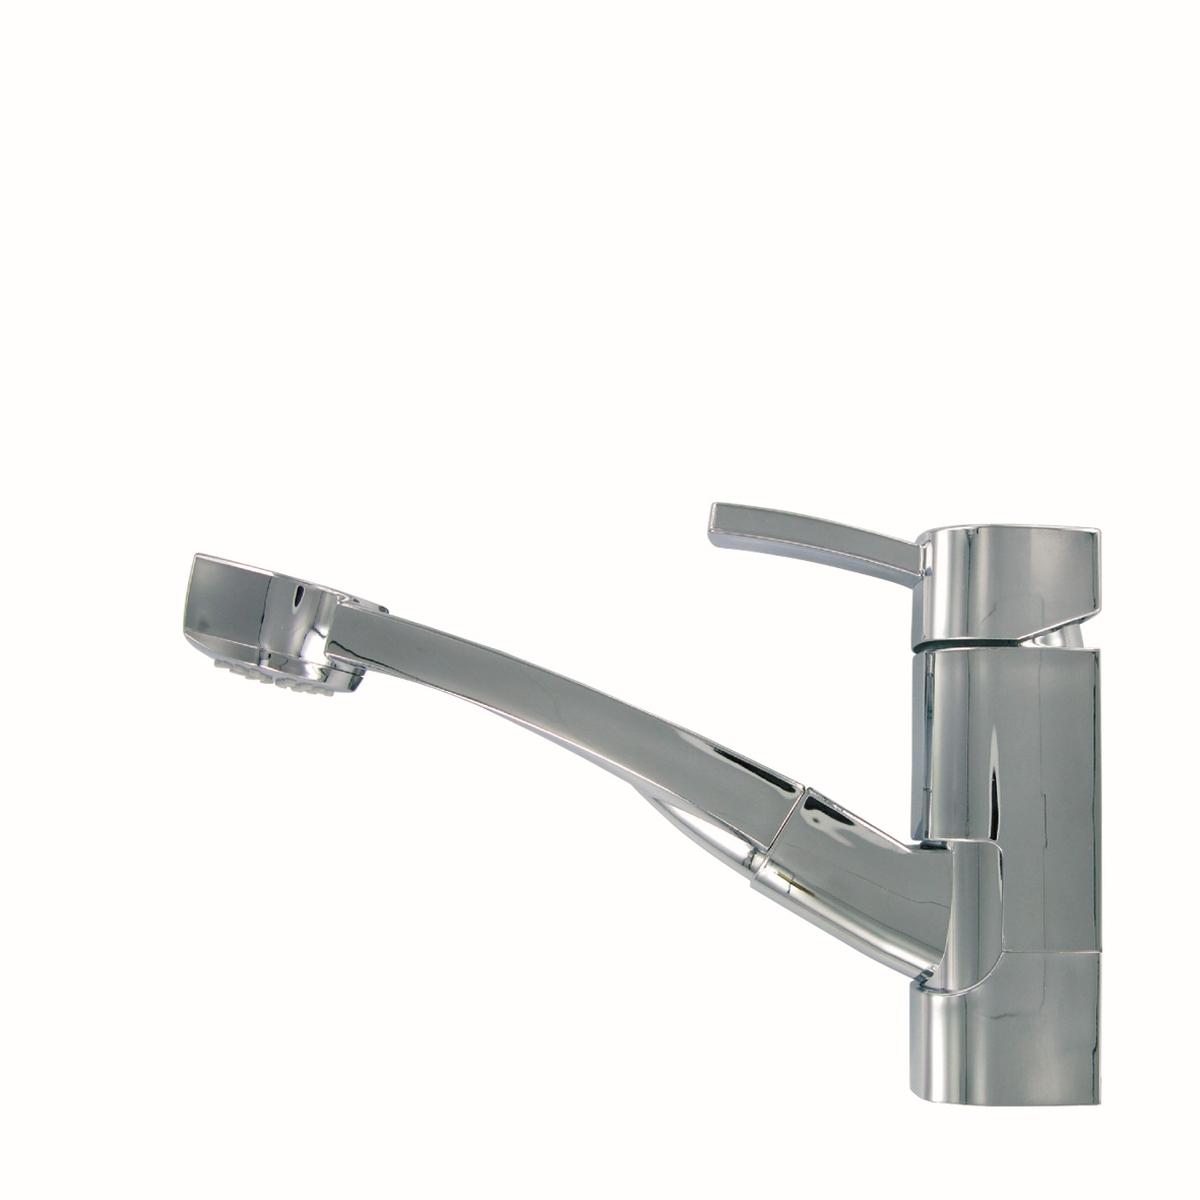 COMET Einhebelmischer CAPRI mit Dusche